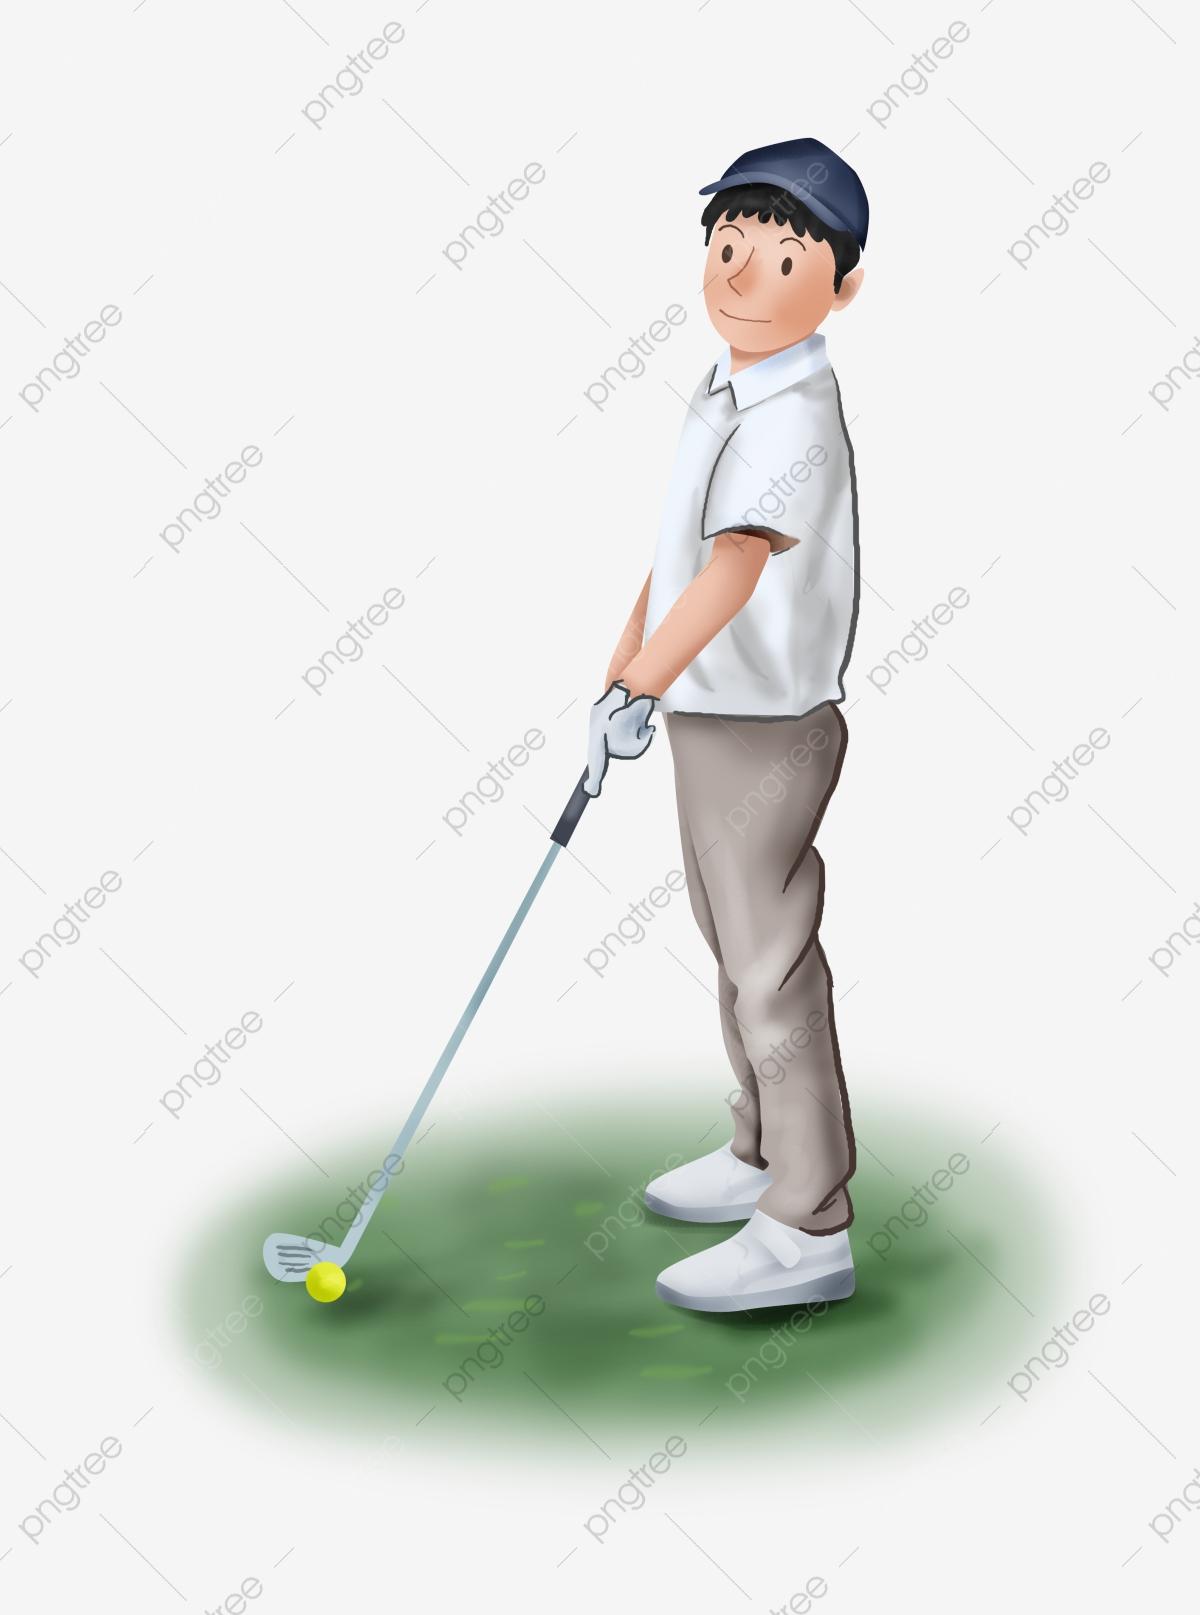 Golf movement png transparent. Golfing clipart male golfer